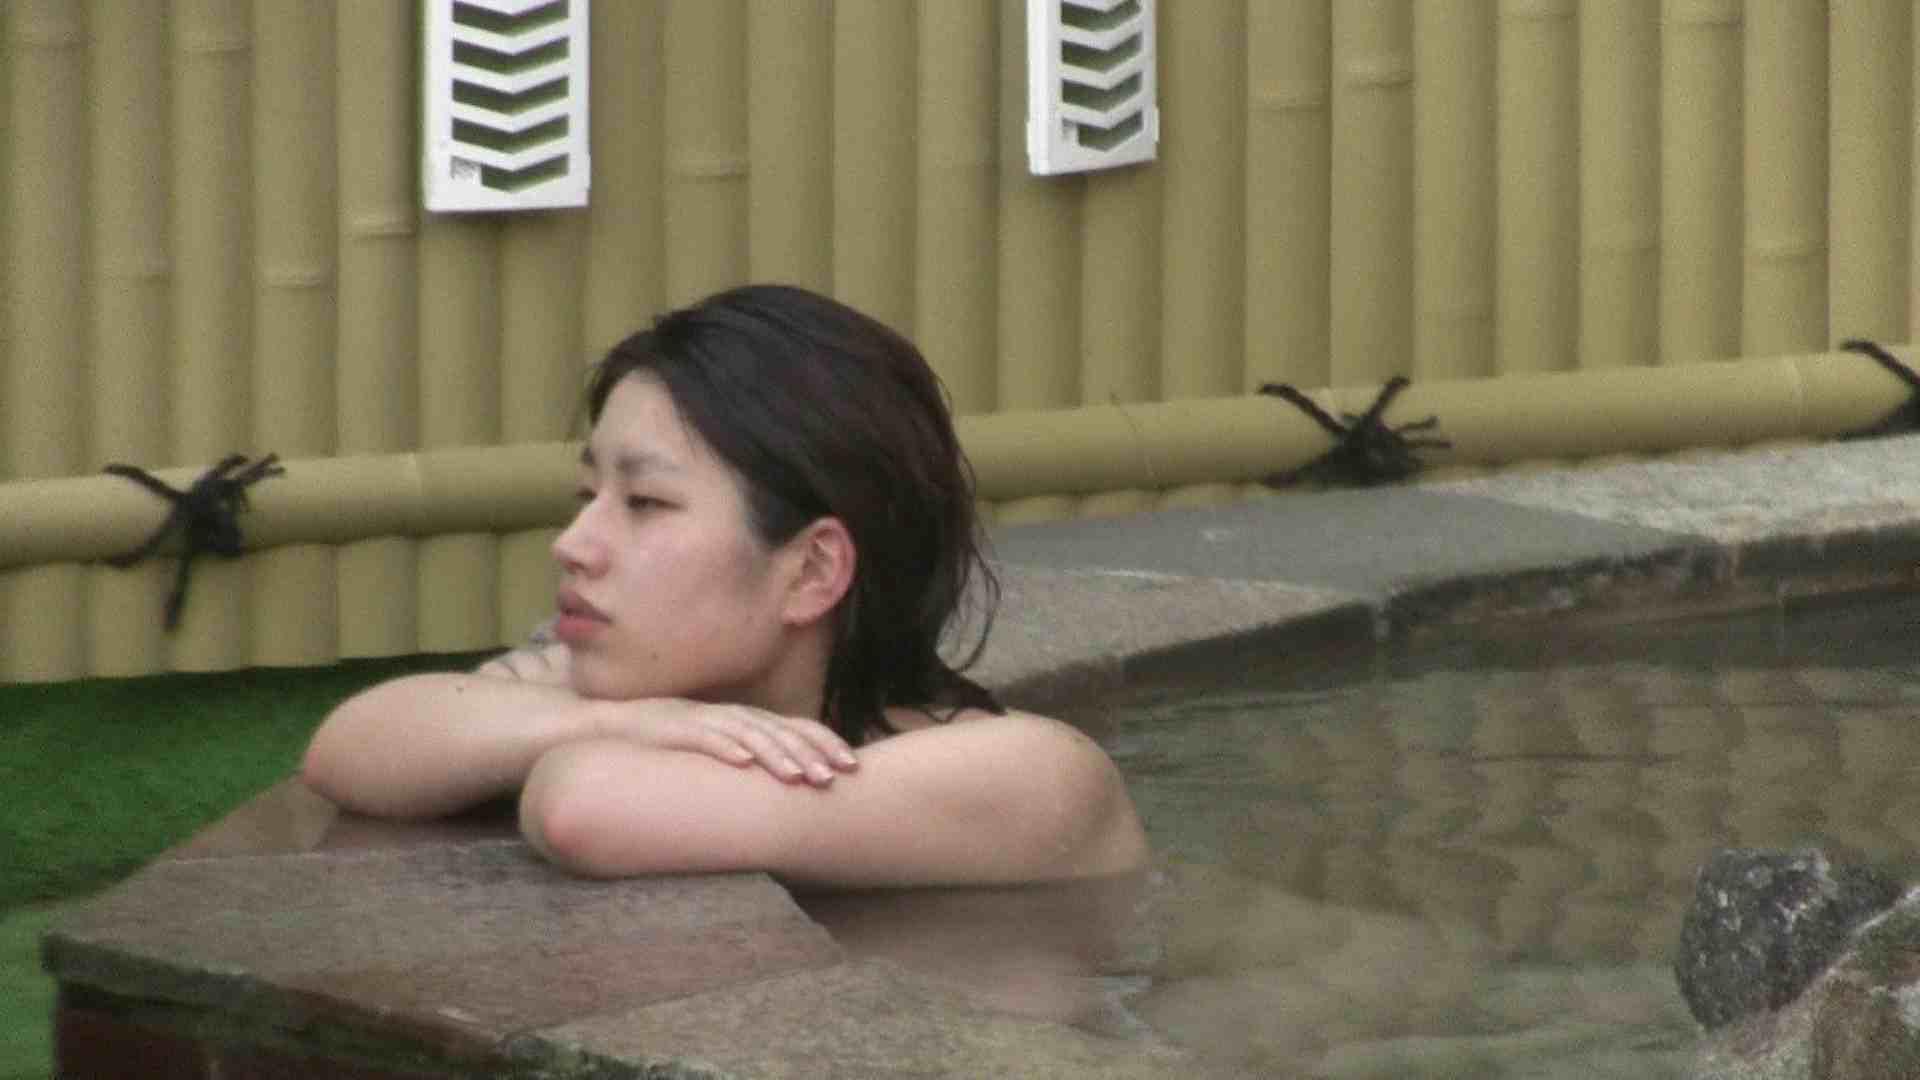 Aquaな露天風呂Vol.230 HなOL | 盗撮  83pic 21